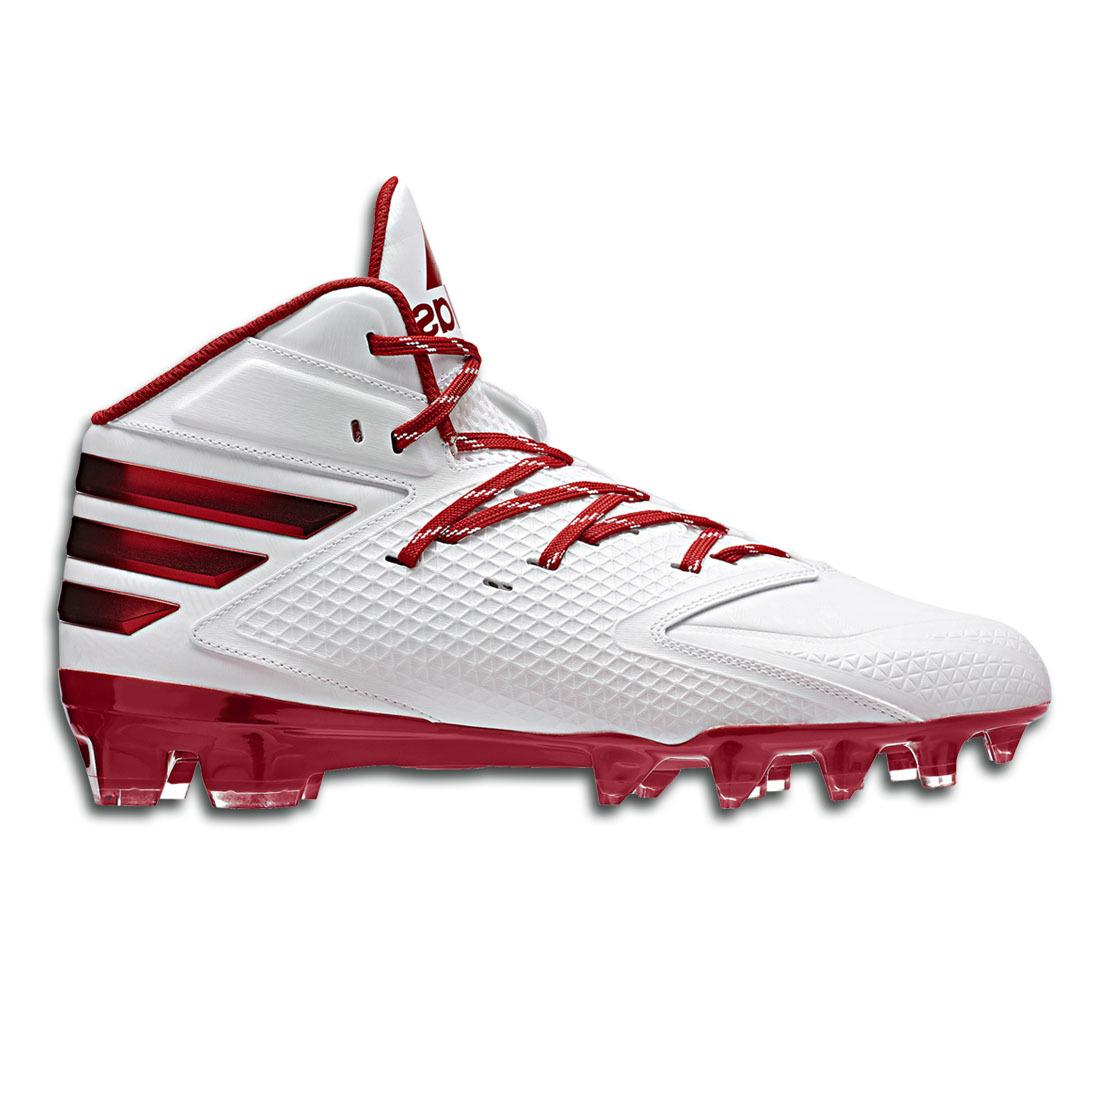 best loved 5b8c8 07108 Adidas Freak X Carbon American Football Equipment Baseball Softball.  Adizero Afterburner V Cleats Core Black ...